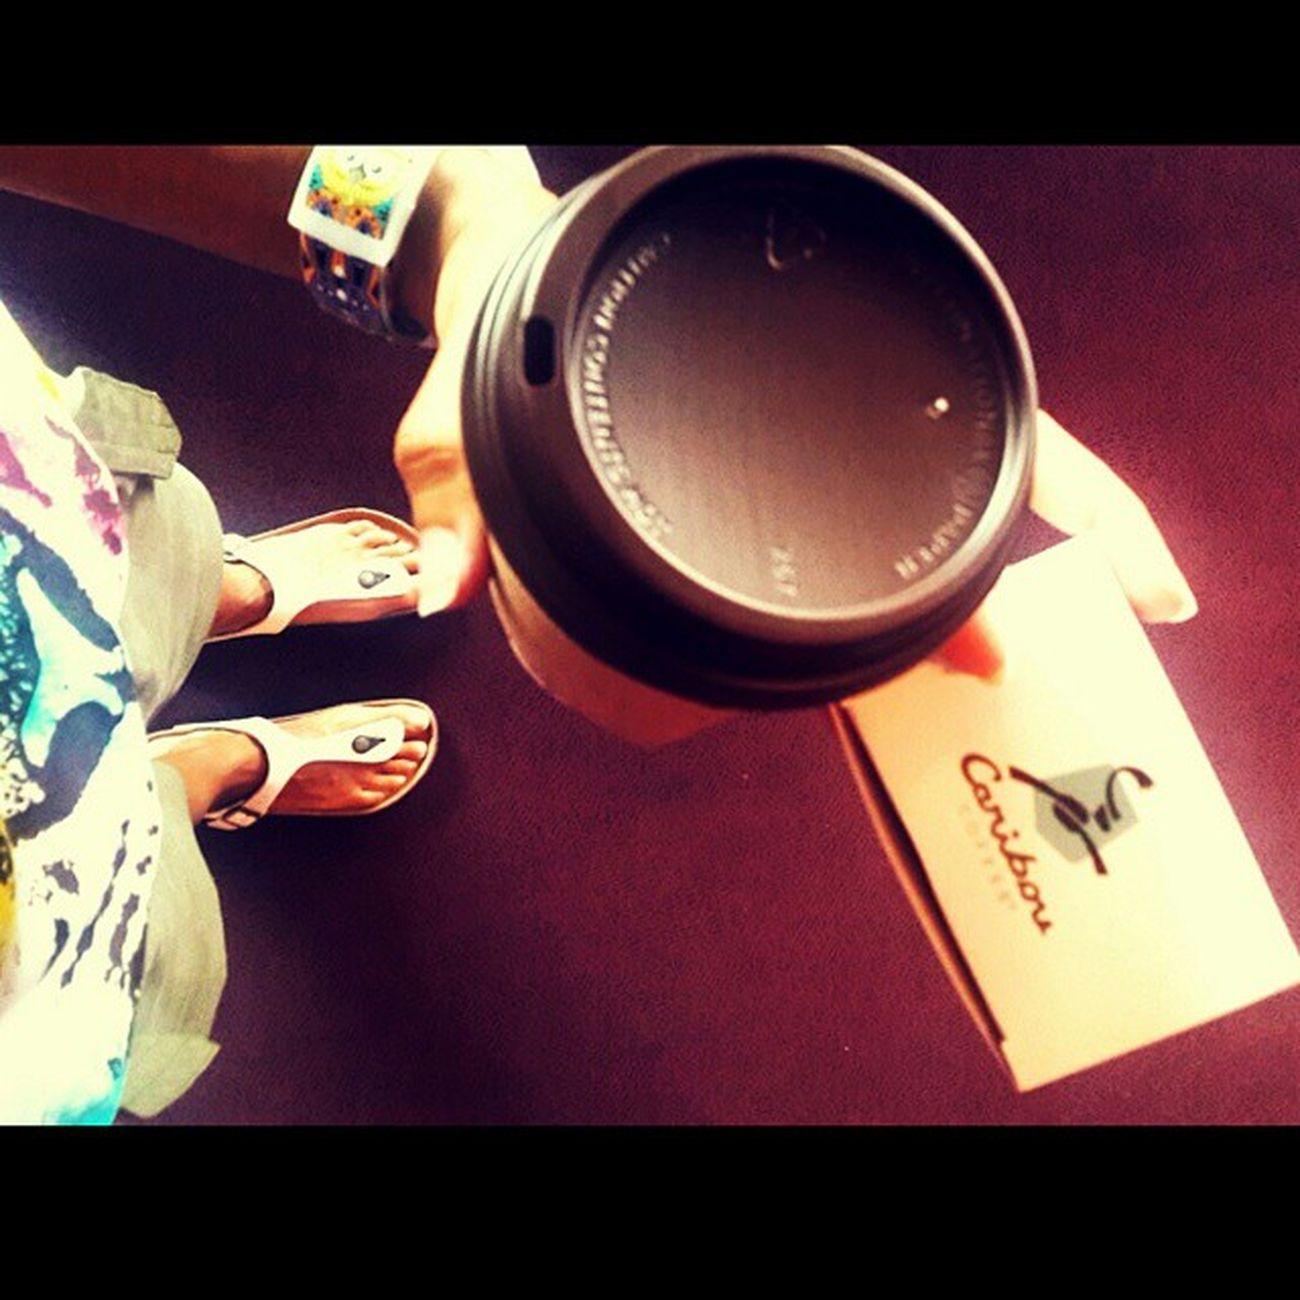 The Monday 💪 Monday Coffee Macaroon Goodmorningcoffee diemondaydie sumner work whereistand latte